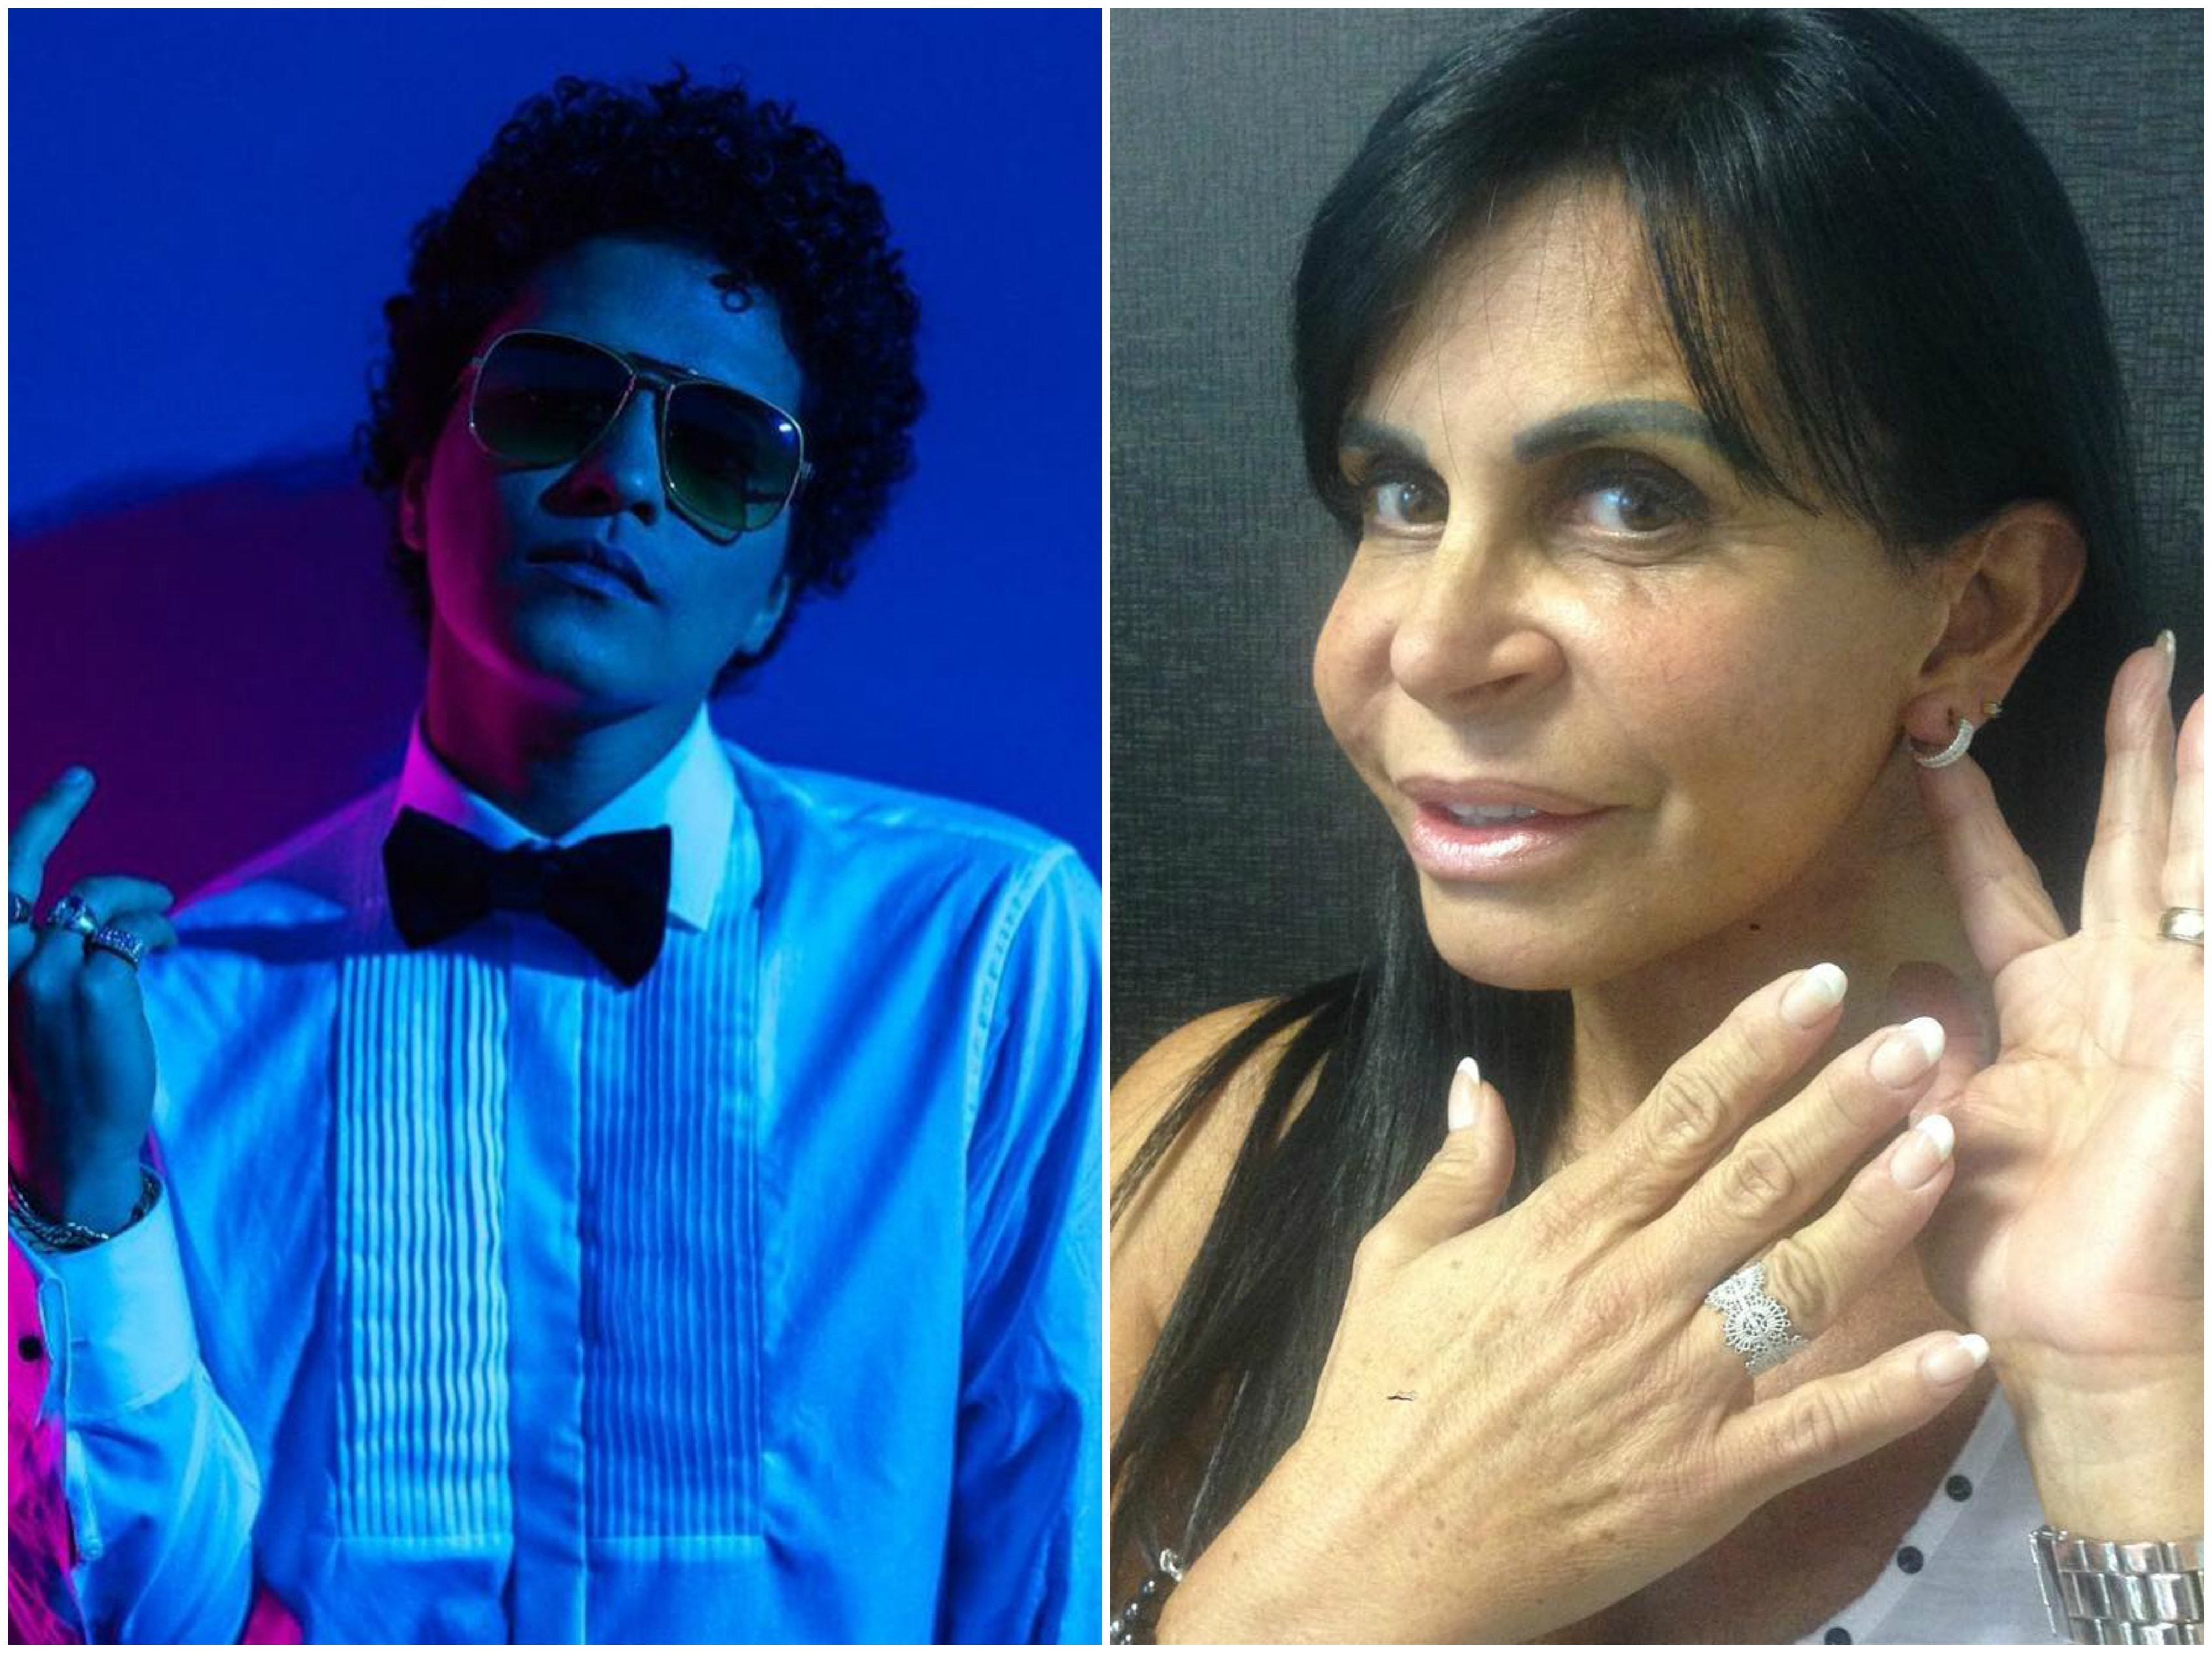 Bruno Mars e Gretchen: estaria nascendo na internet uma nova amizade? (Foto: Reproduo/Instagram)